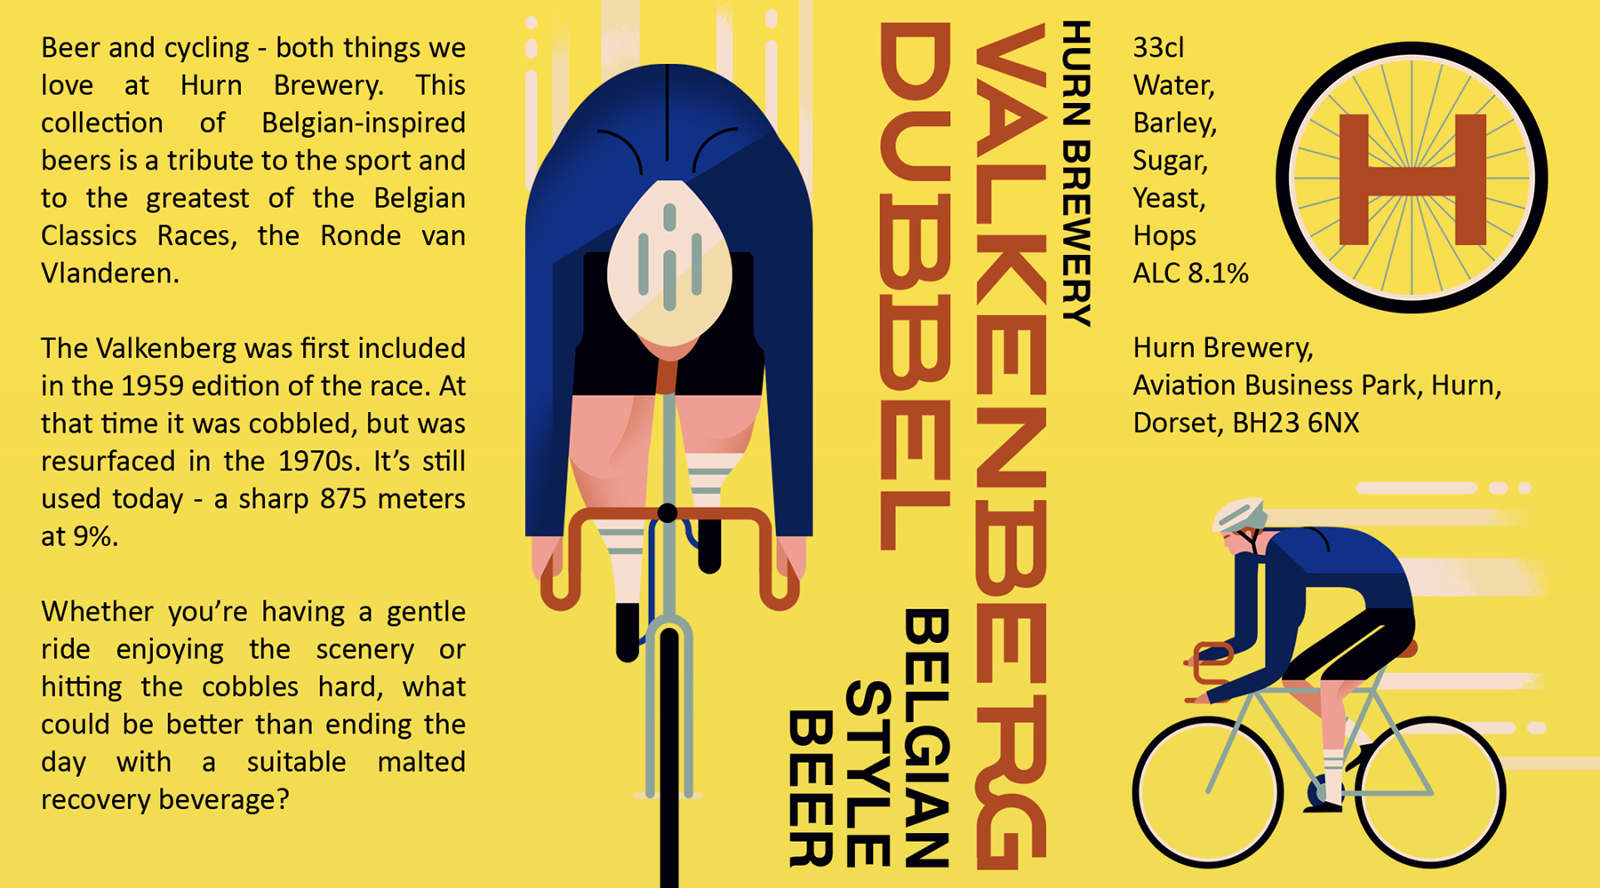 Beer-Label-Valkenberg-Dubbel_1600_c.jpg